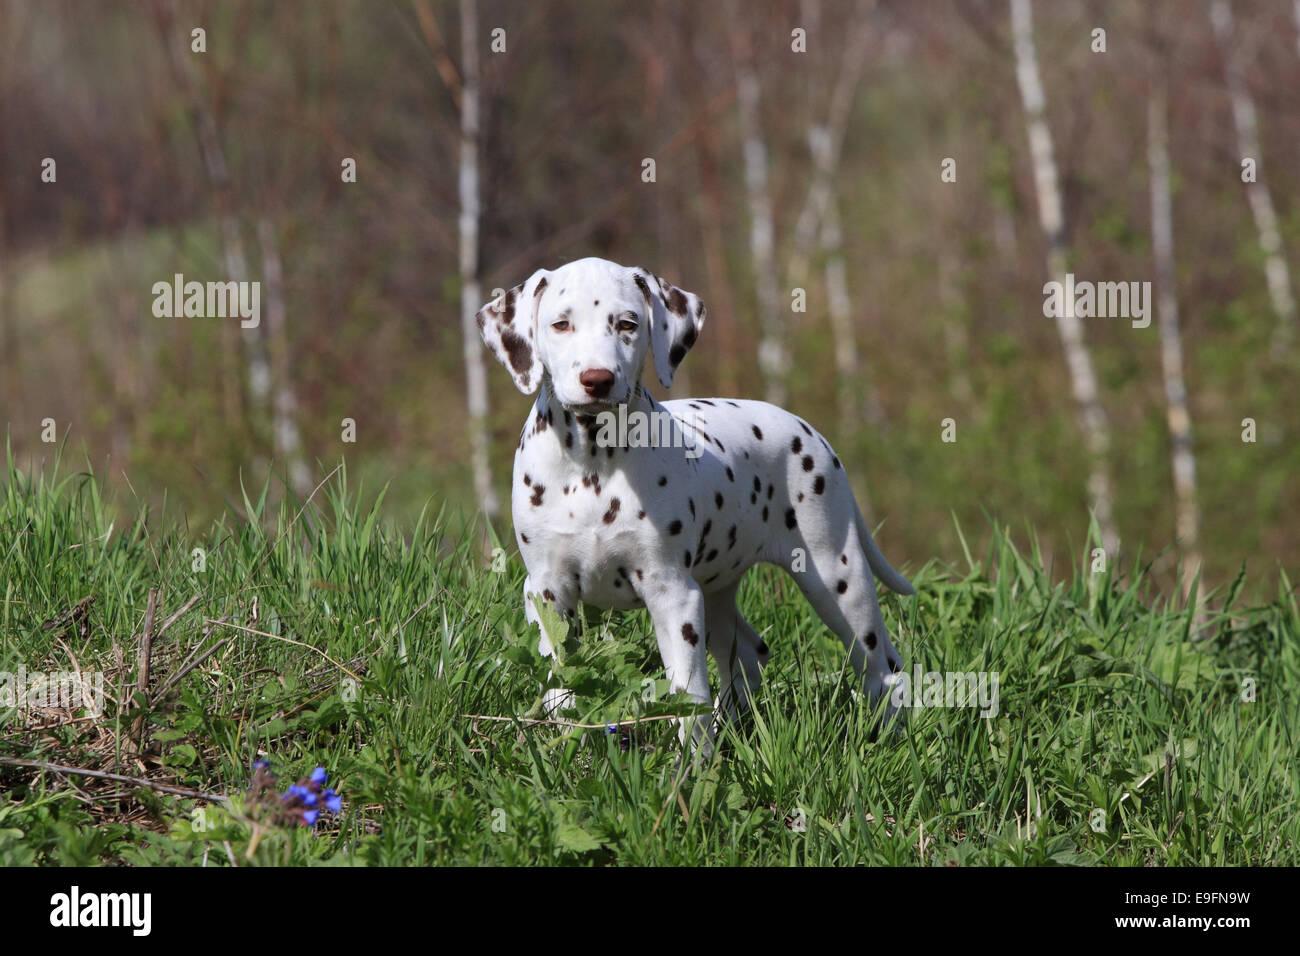 Dalmatian puppy dog - Stock Image